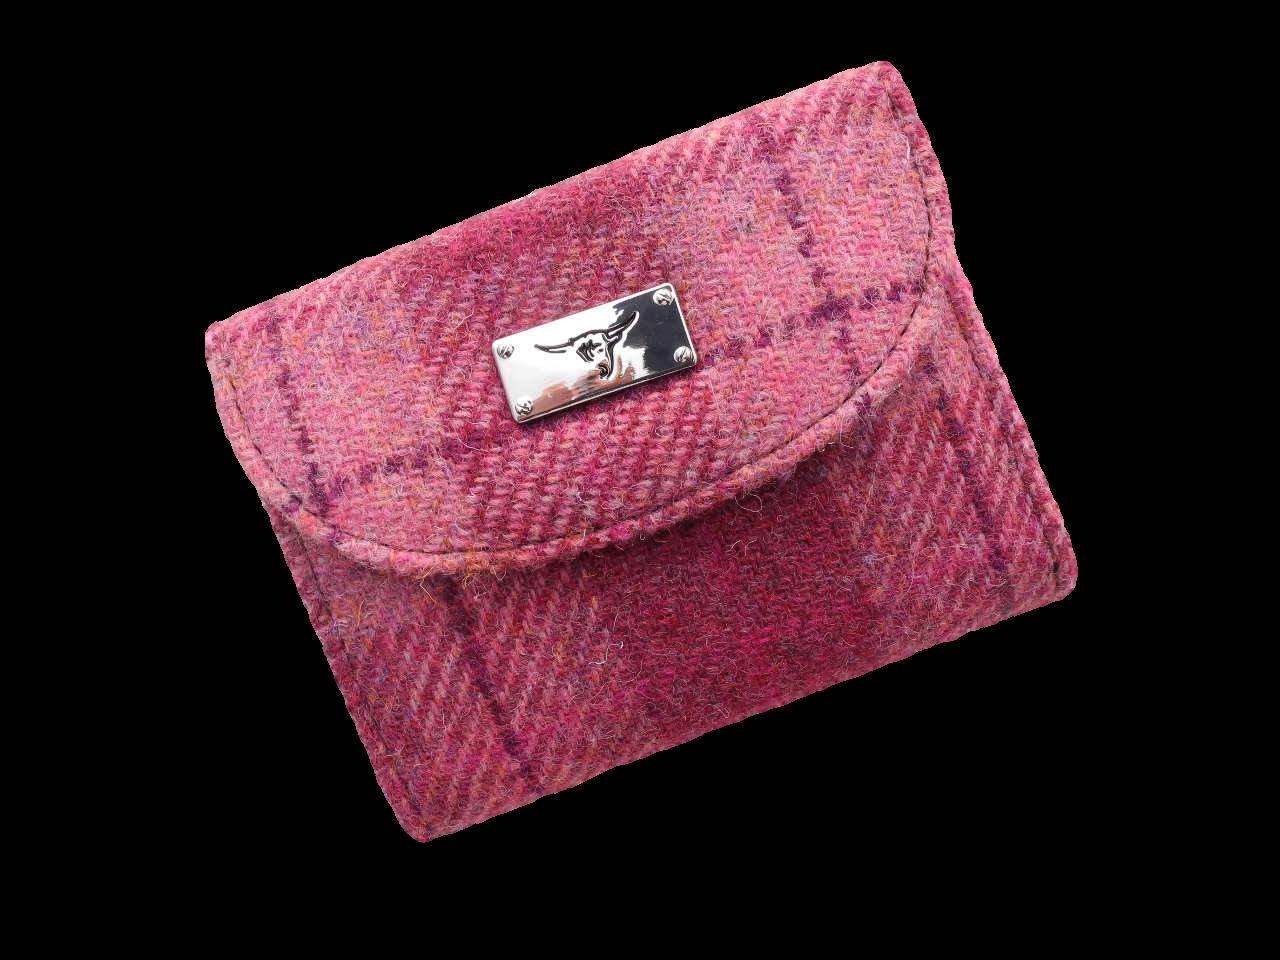 scottish ladies gift harris tweed purse pink wine check